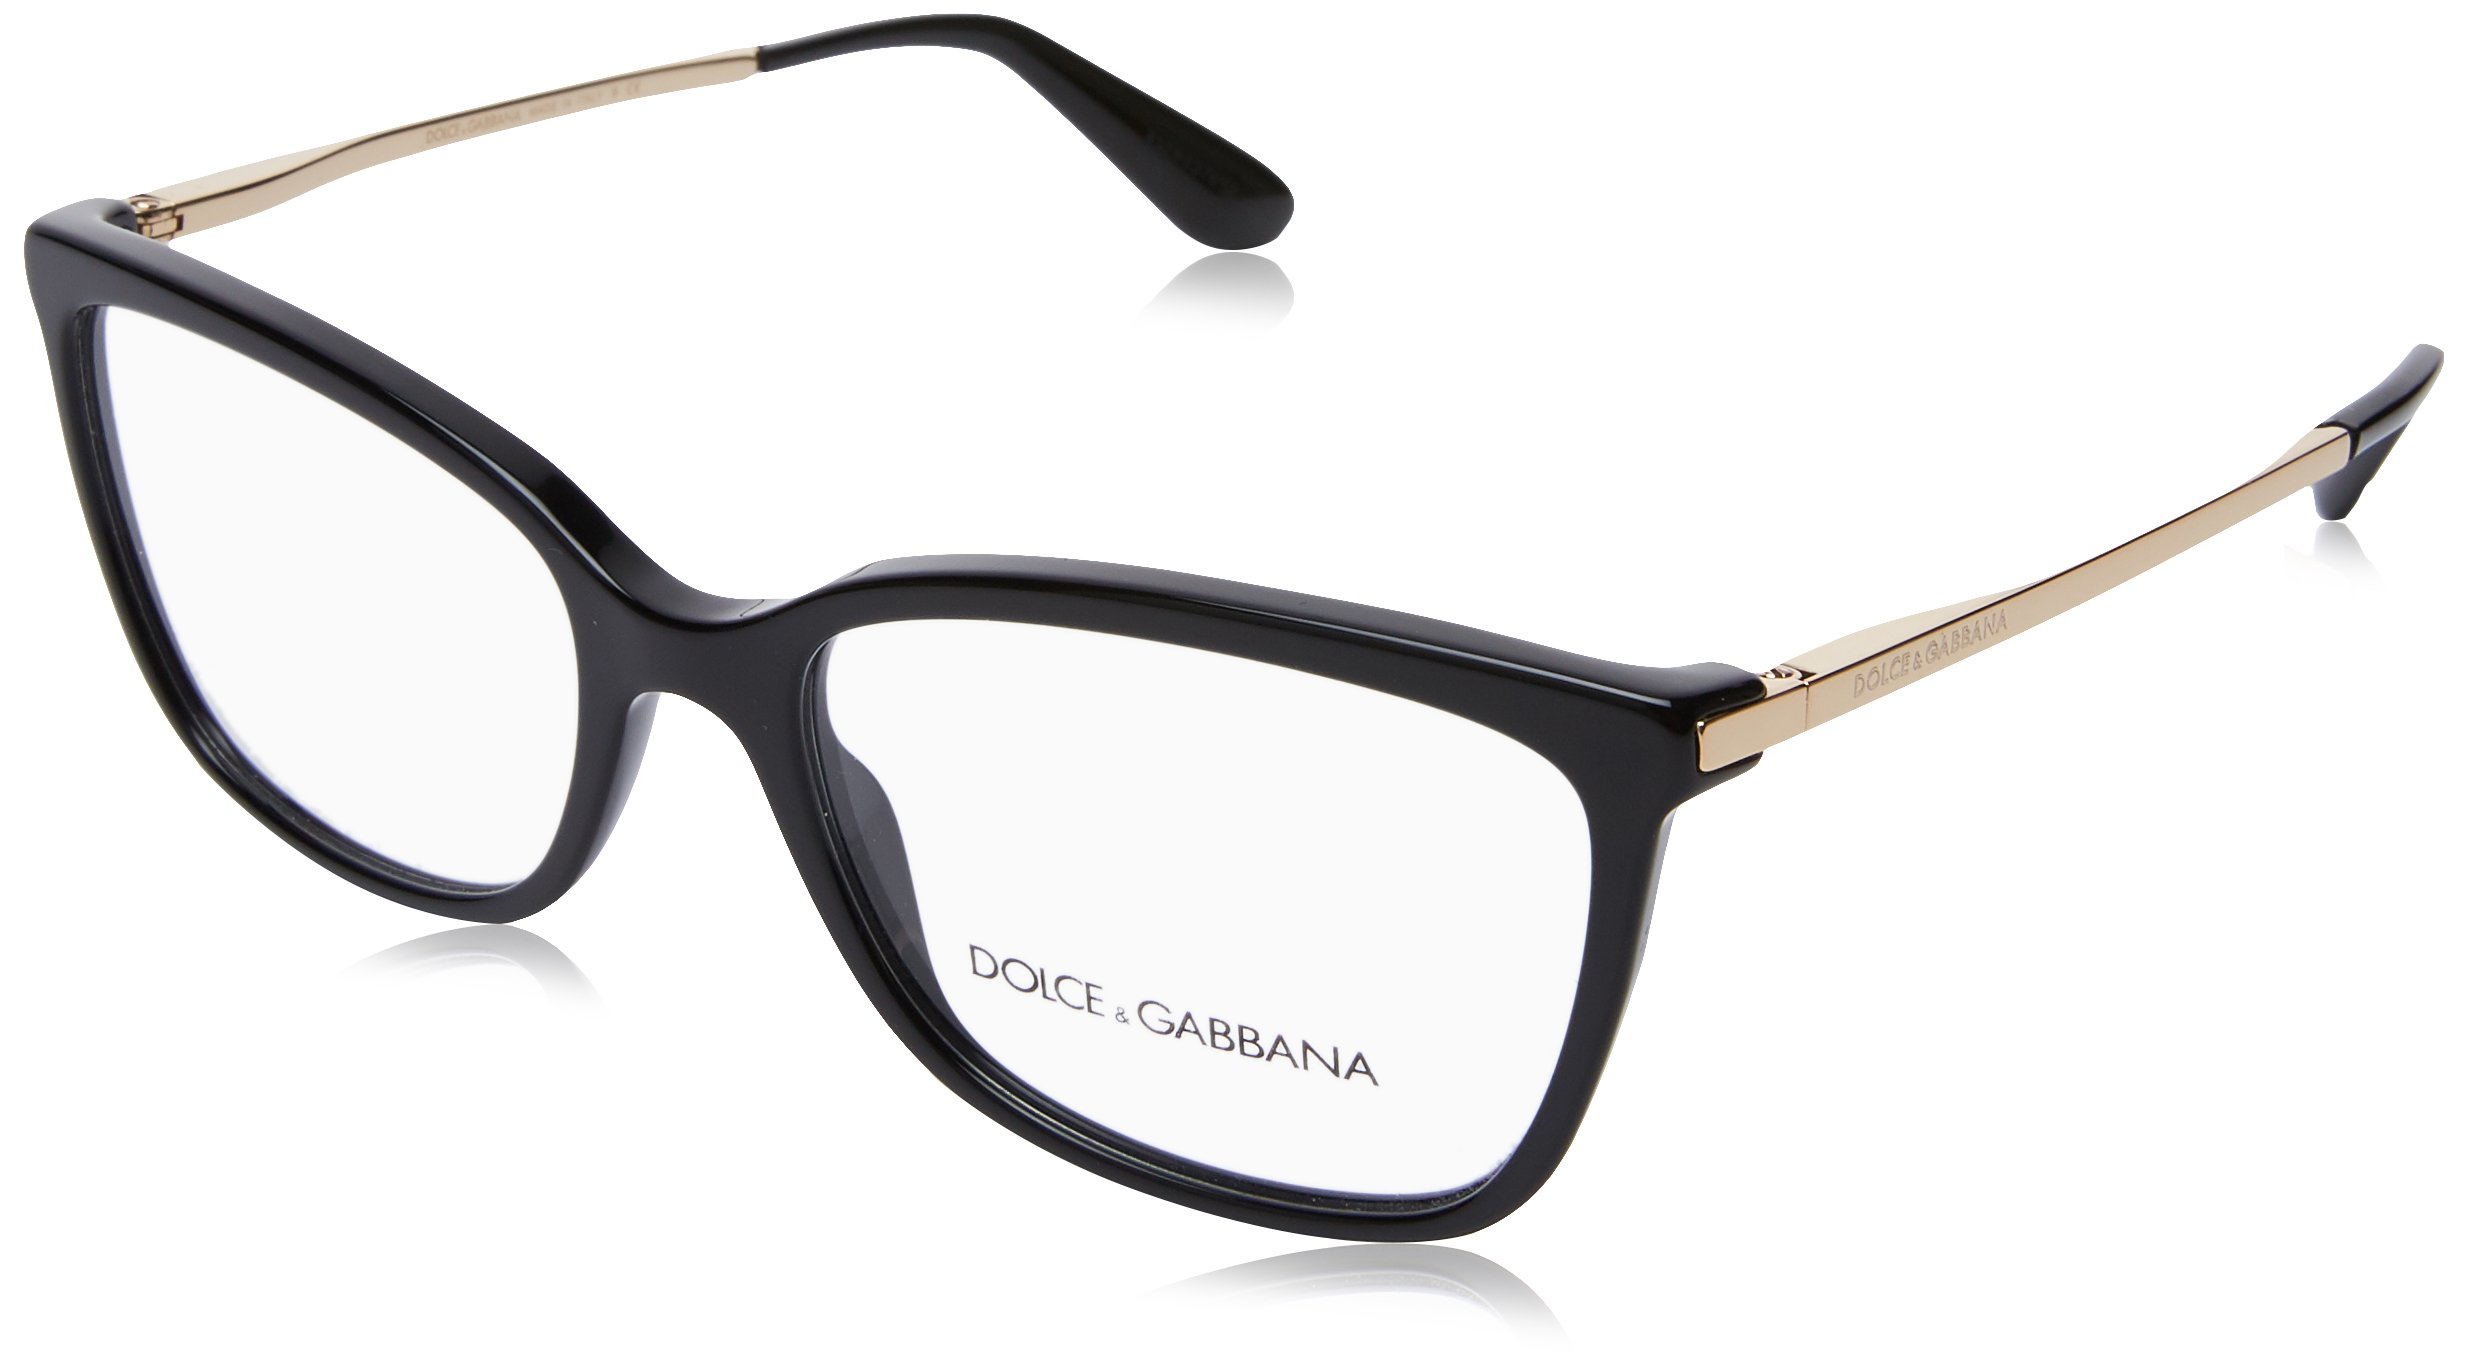 3ef39a10f4 Dolce Gabbana DG3243 Eyeglass Frames 501-52 - Black DG3243-501-52